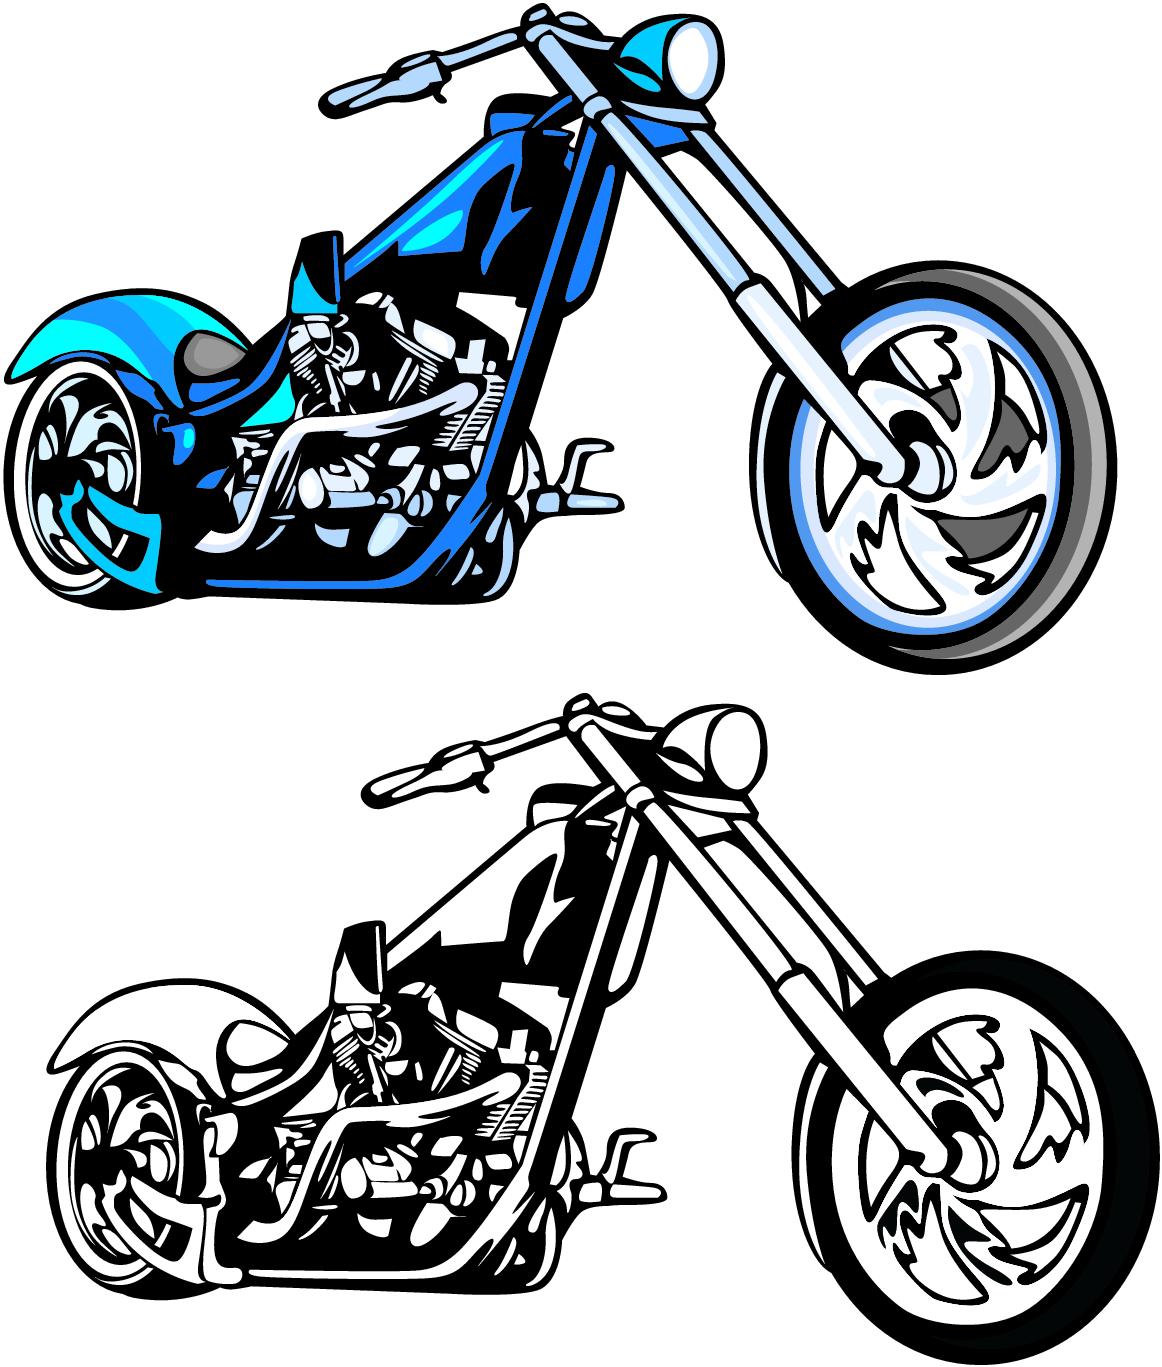 1162x1367 Harley Davidson Clip Art Free 2 Welz's Logo Clip